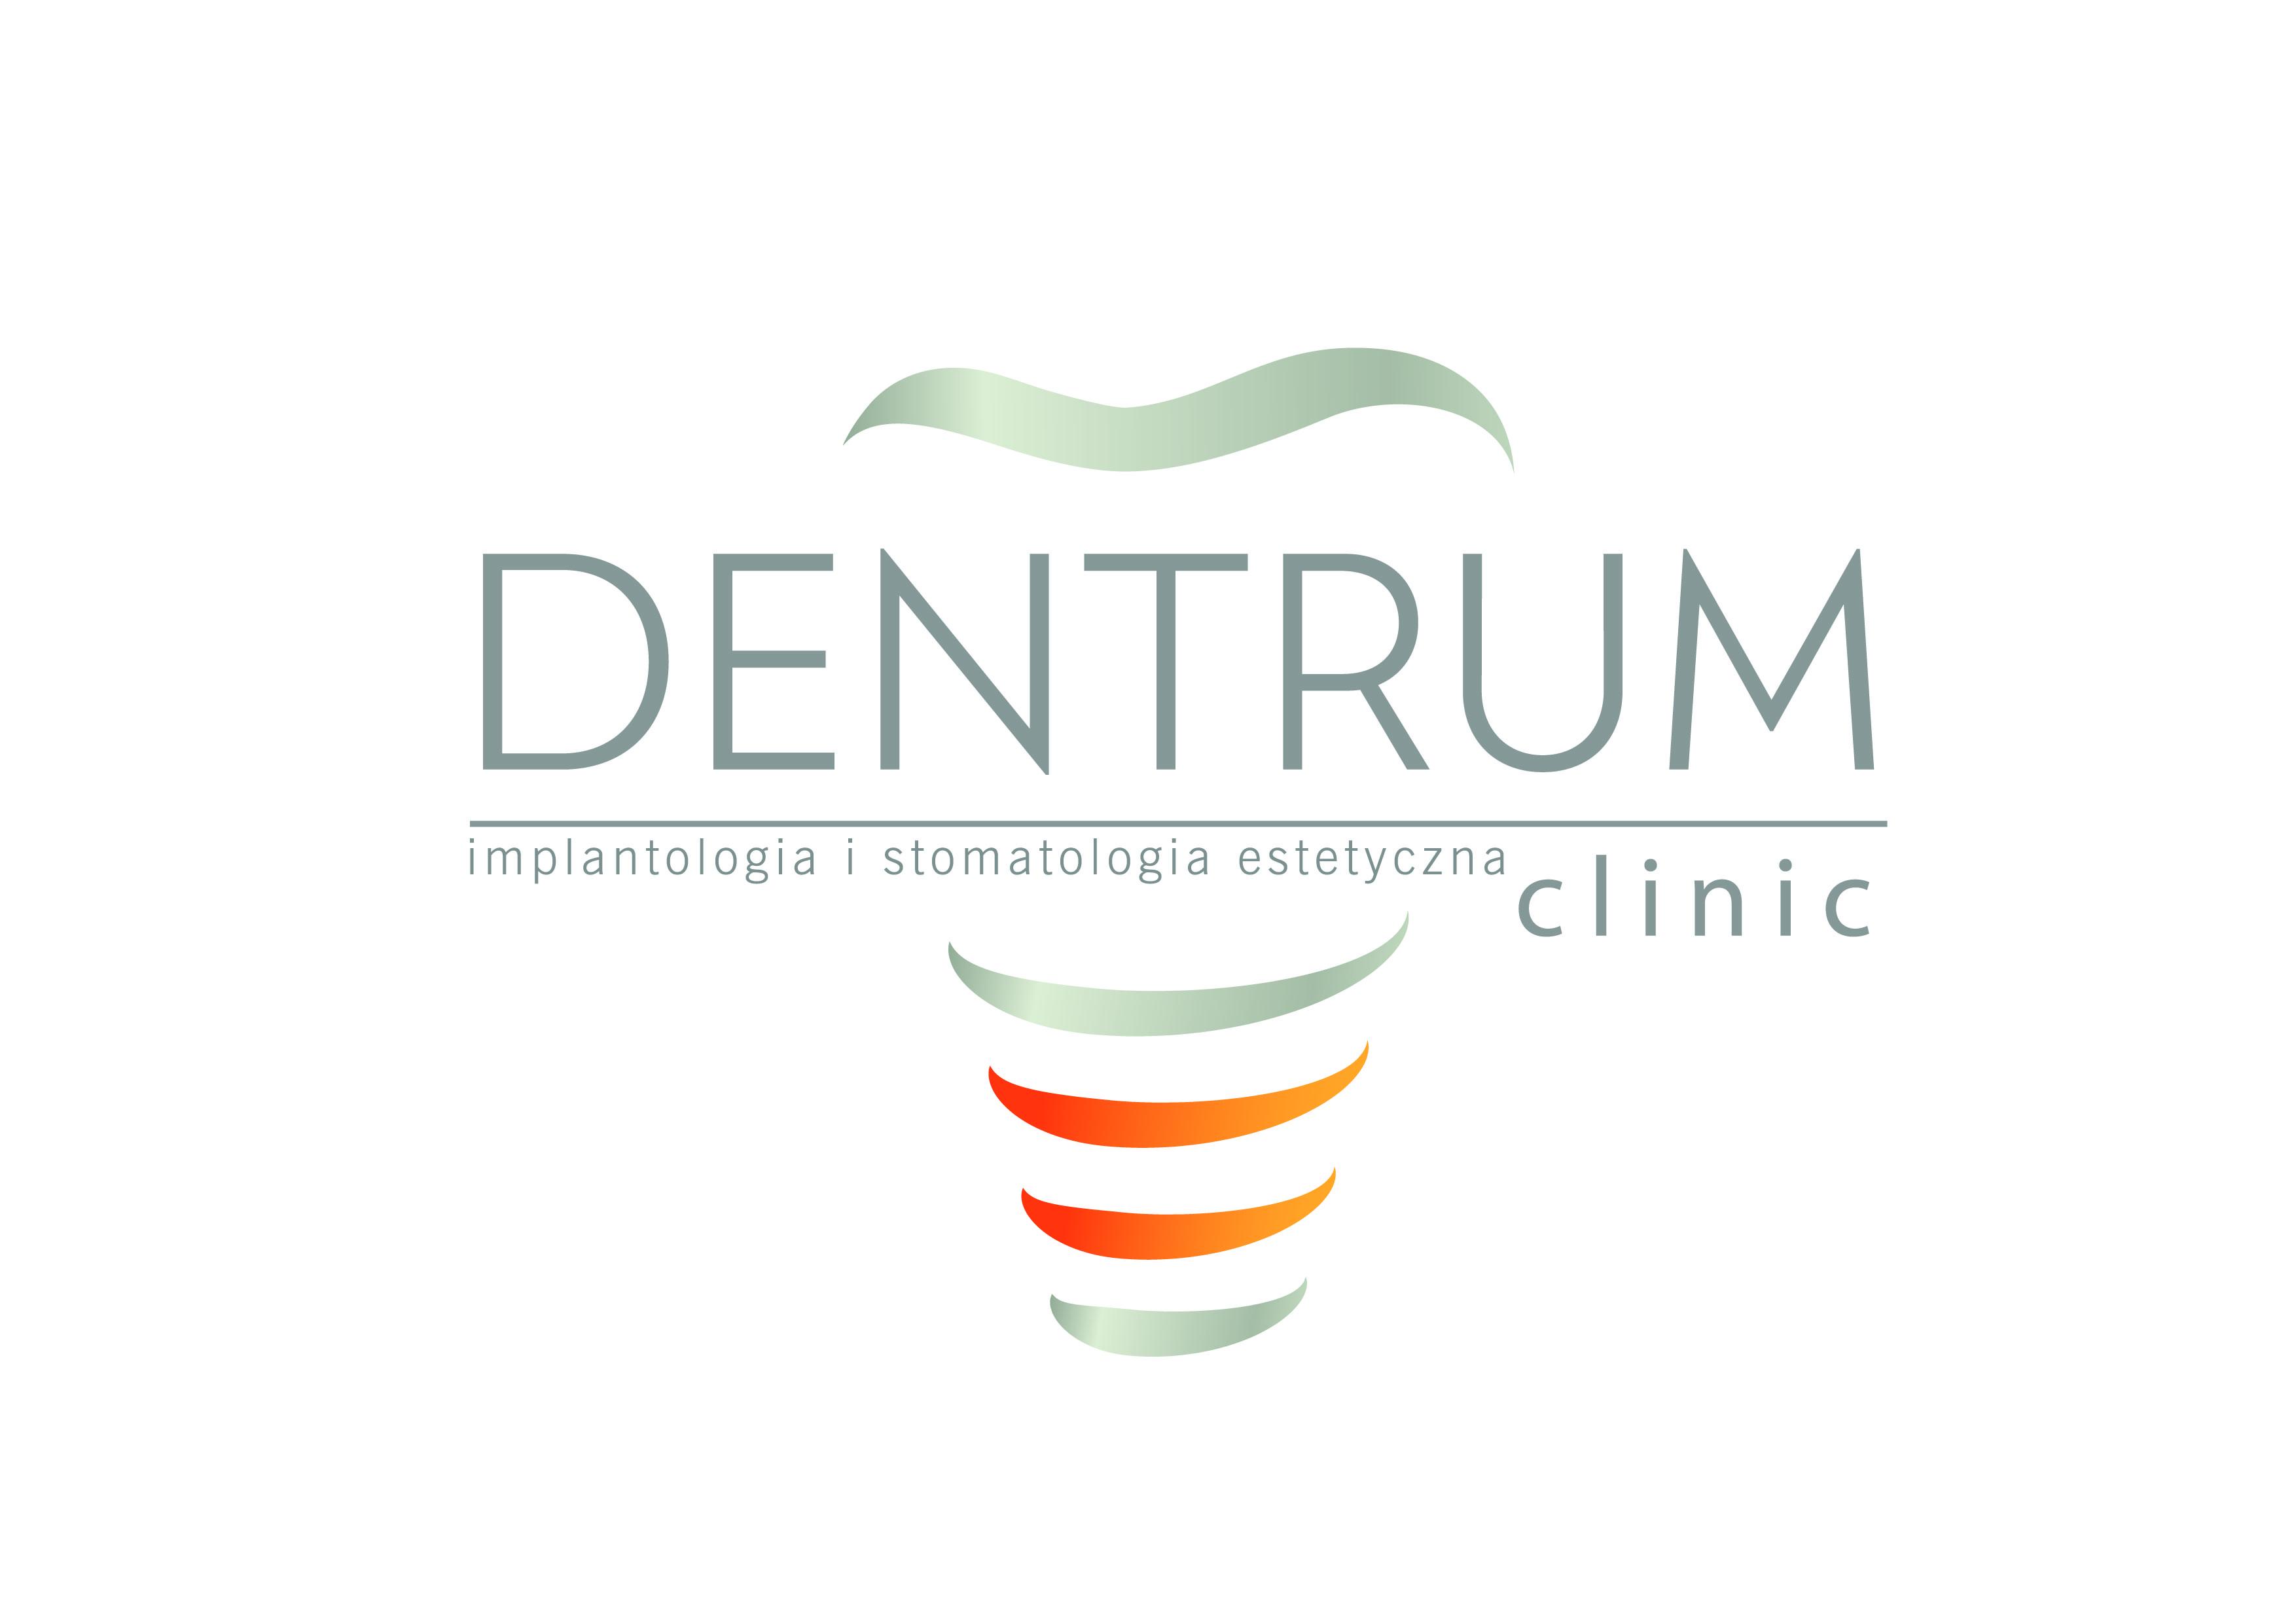 Dentrum-01.jpg